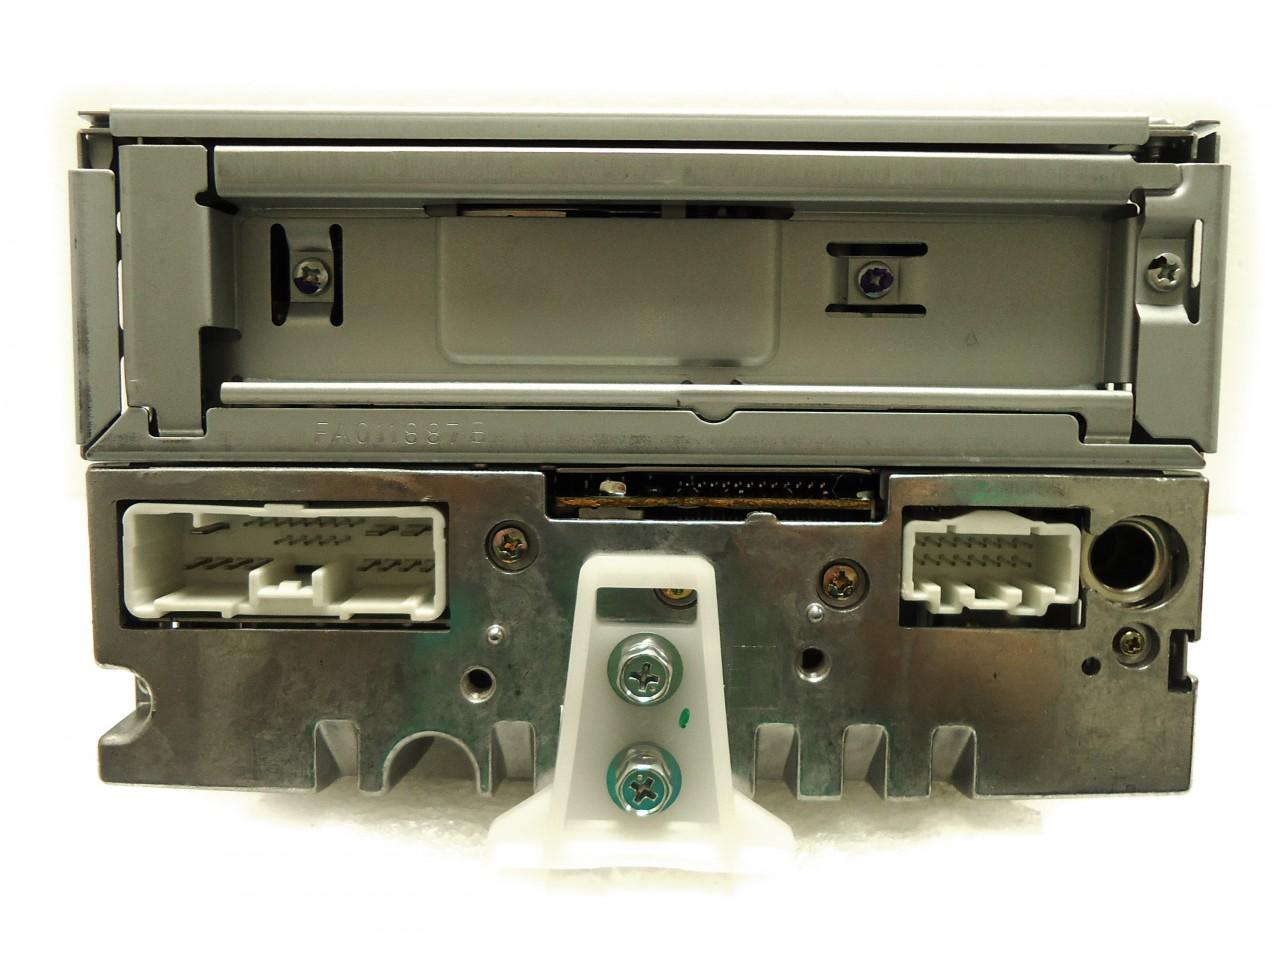 hight resolution of honda odyssey radio wiring diagram images diagram for 2001 mazda 626 horn 2001 daewoo lanos wiring